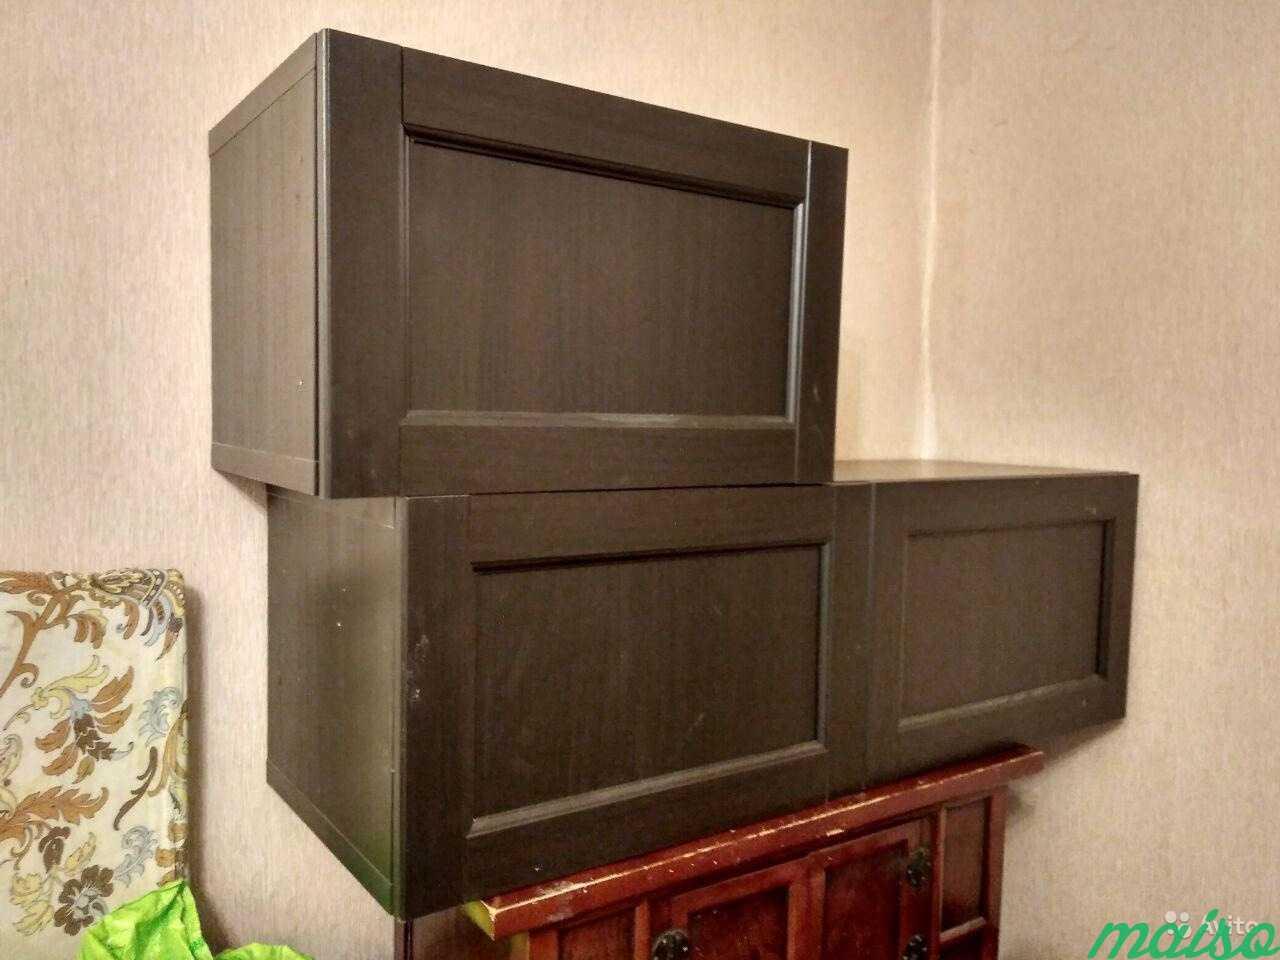 Система шкафов IKEA besta в Москве. Фото 3